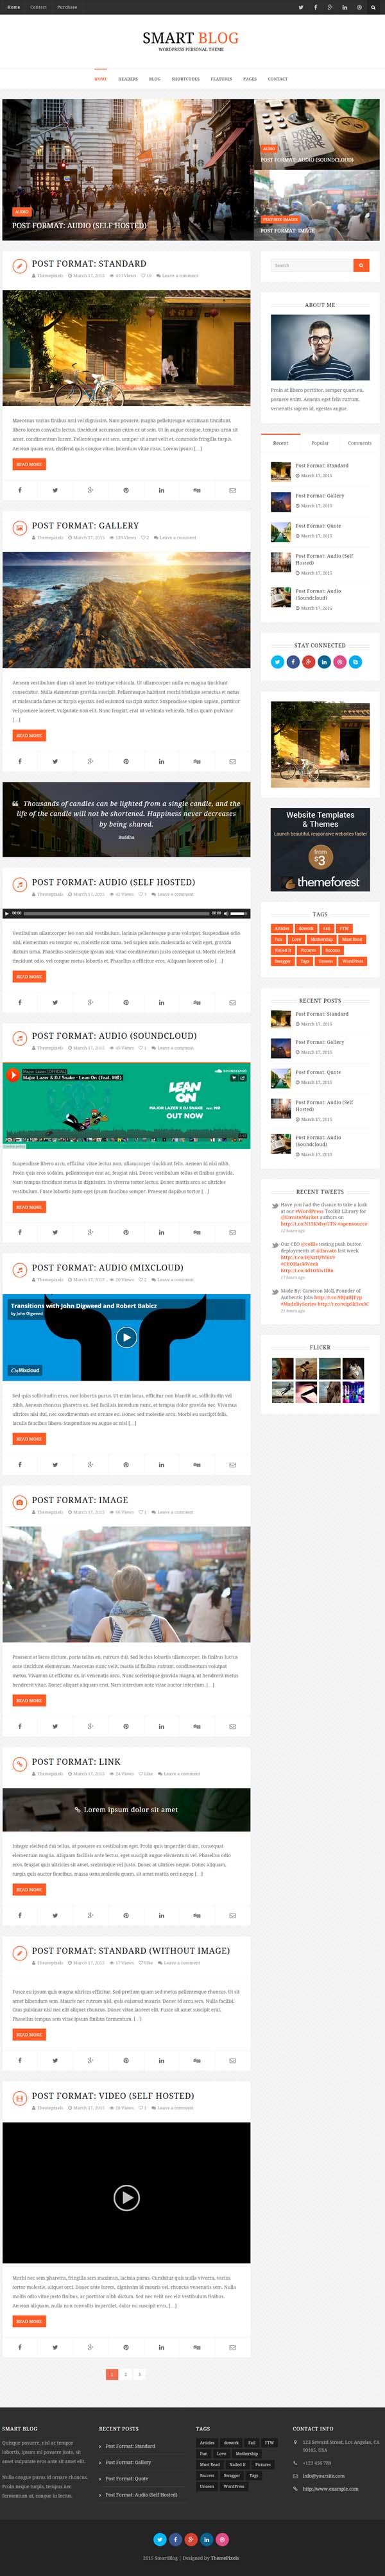 Smart Blog – WordPress Theme For Personal Blog